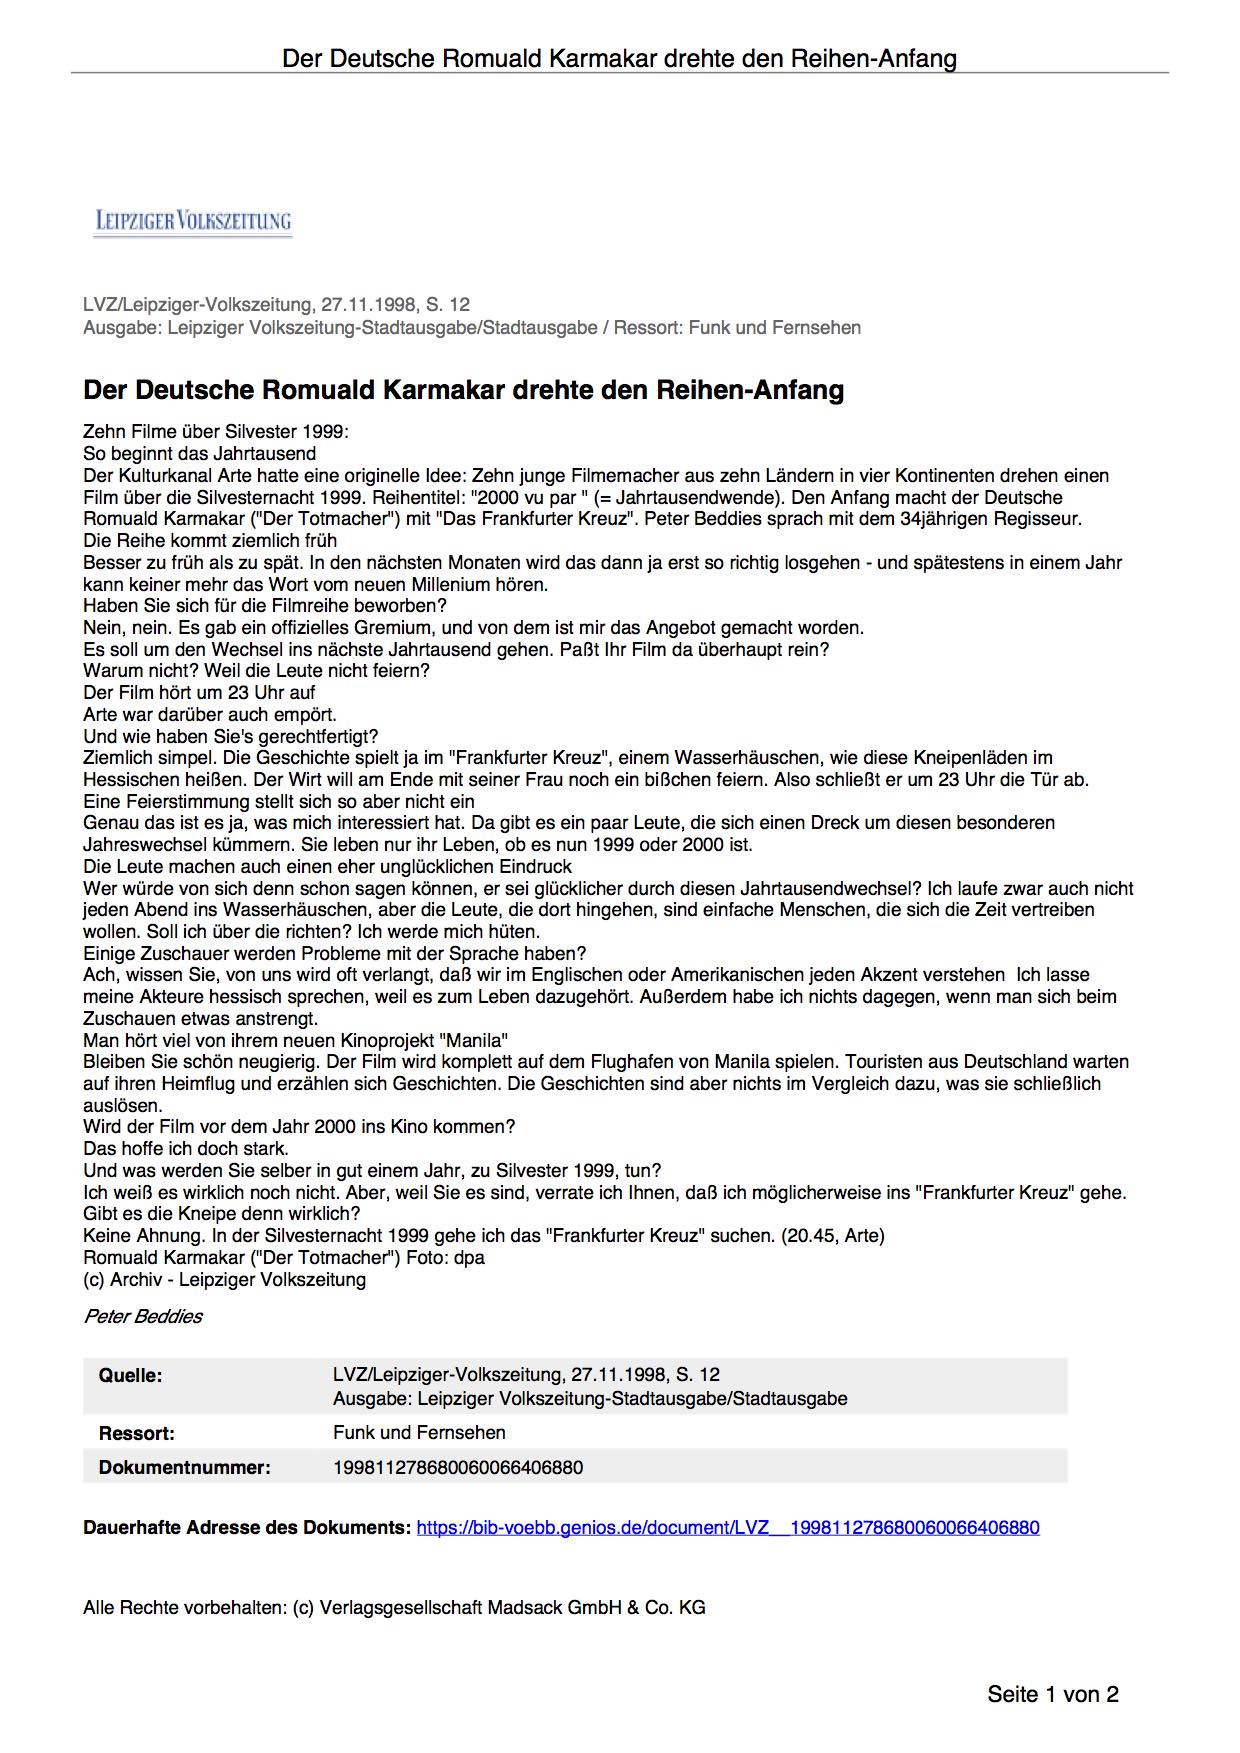 DER DEUTSCHE ROMUALD KARMAKAR DREHTE DEN REIHEN-ANFANG